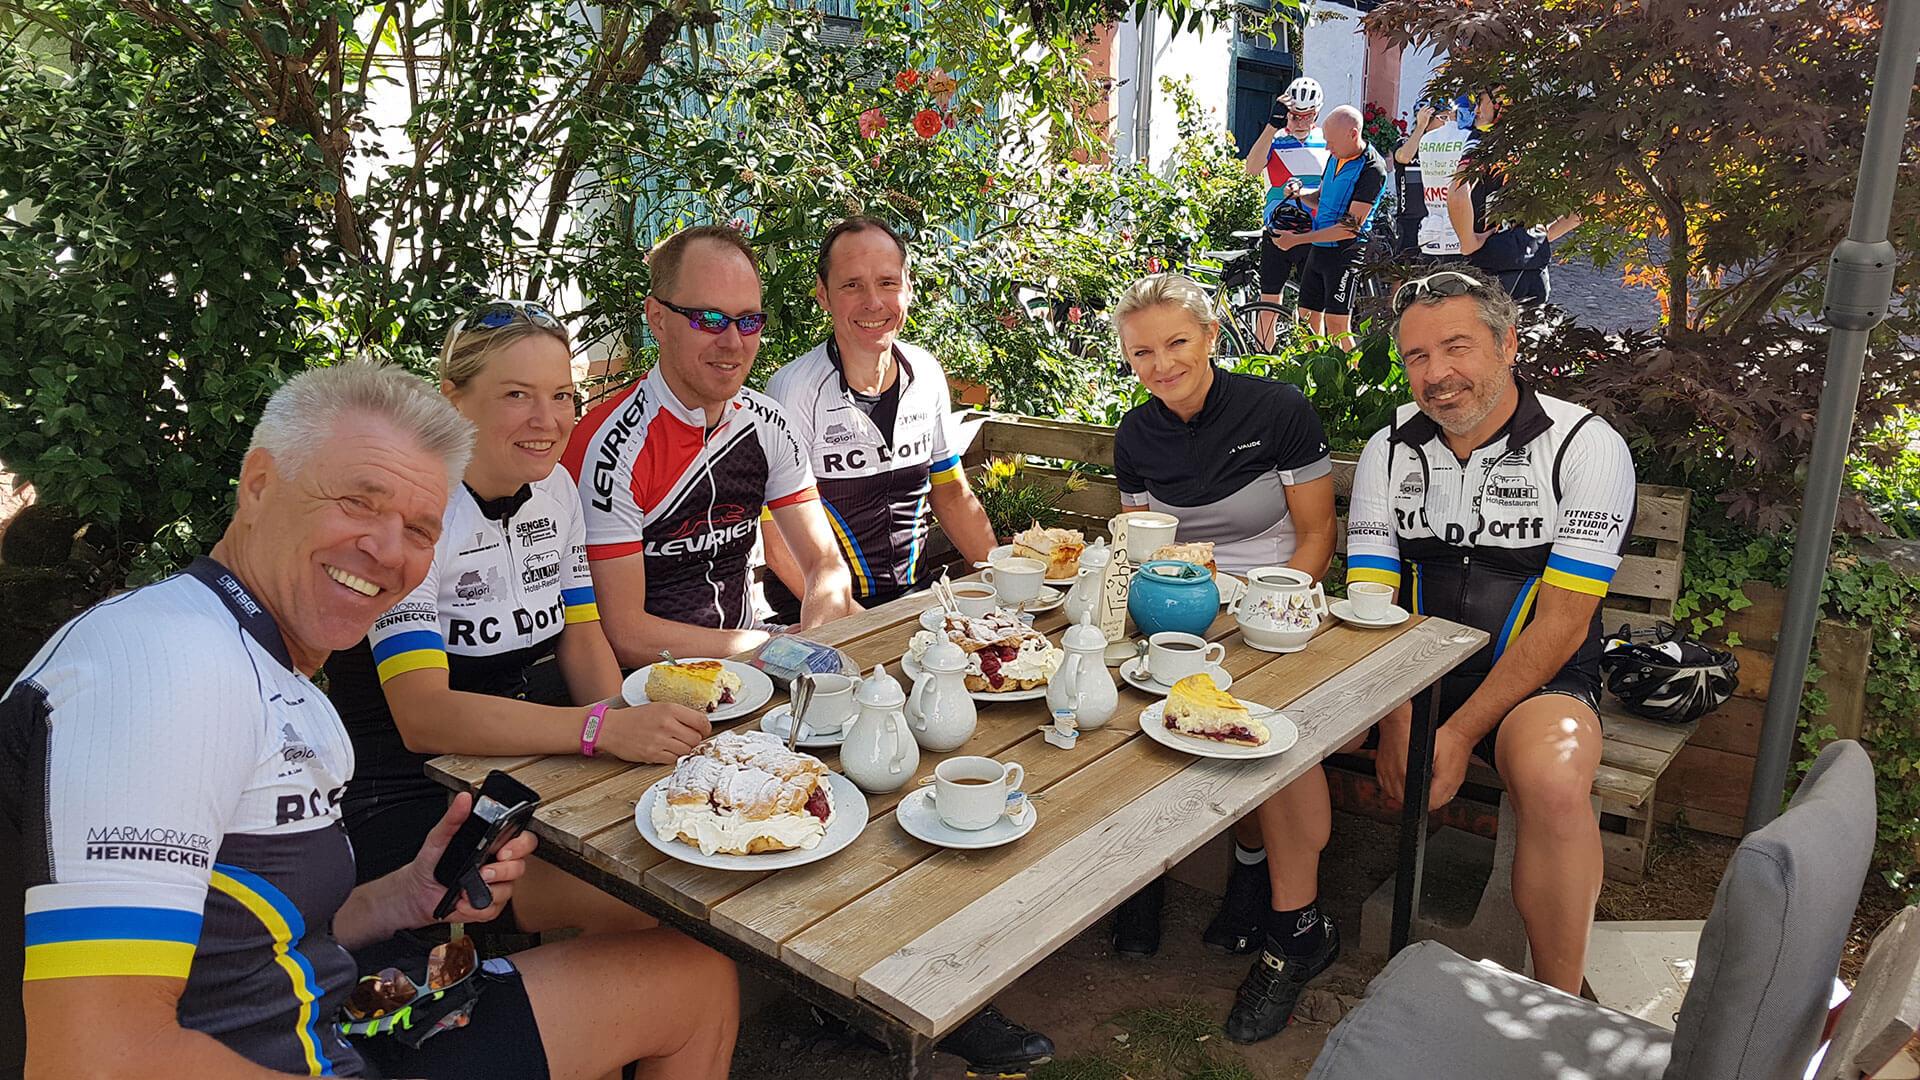 RC Dorff Team ROAD Ausfahrt 21.09.2019